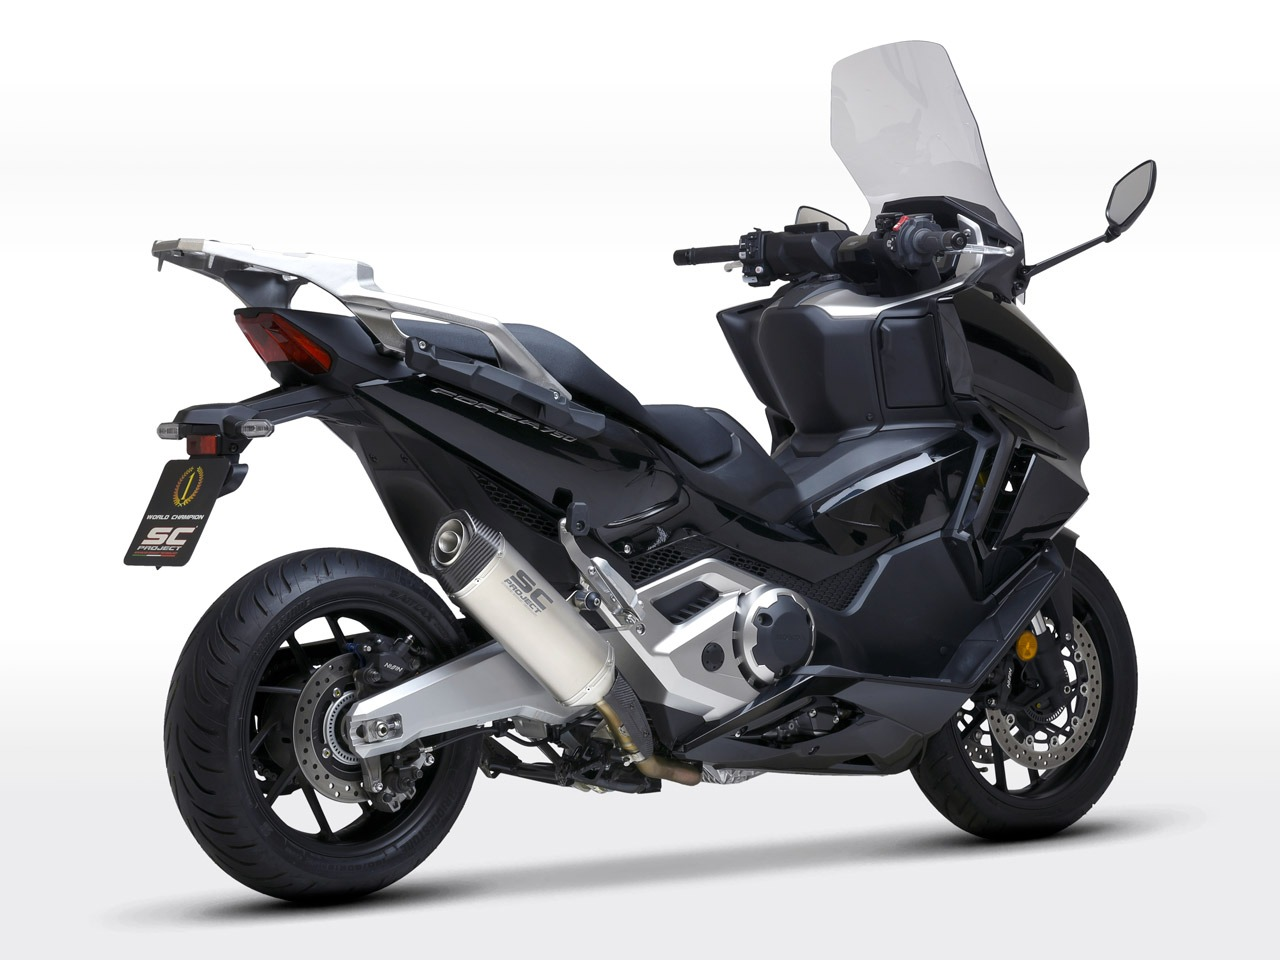 Honda_Forza750_my2021_SC1S-Titanio_3-4Posteriore_1280x960px_web-partnership